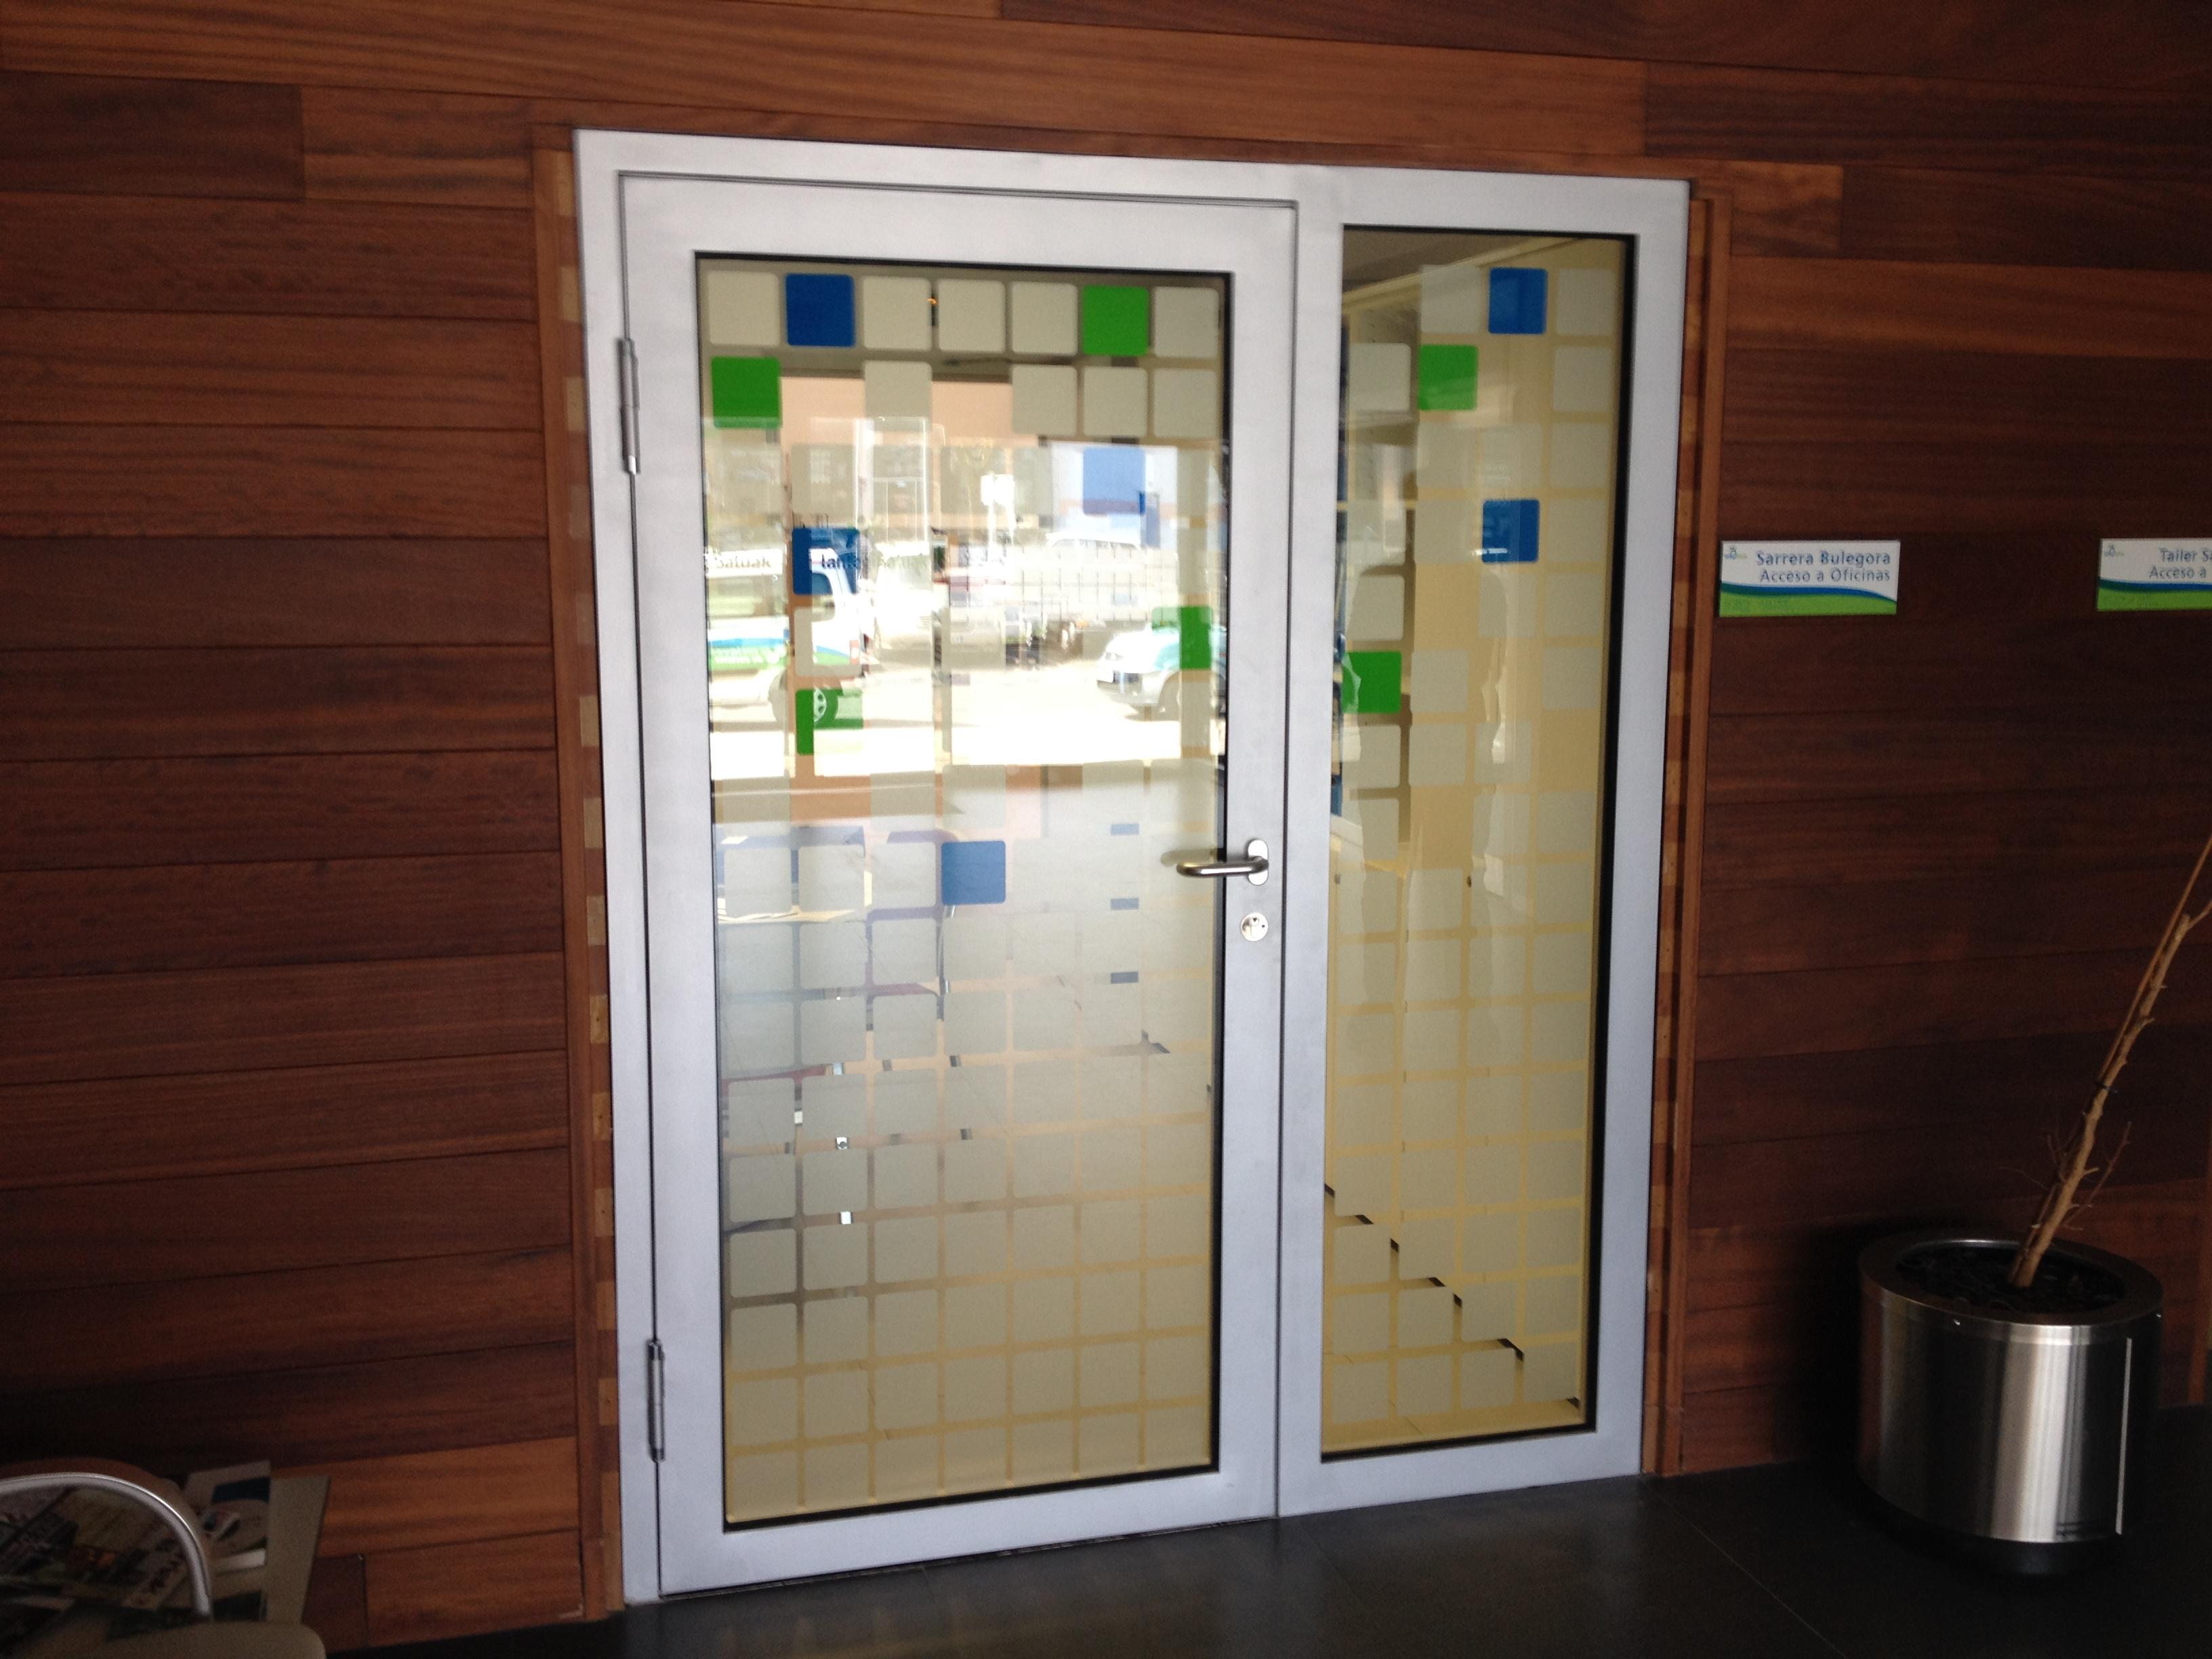 puerta cortafuego acristalada